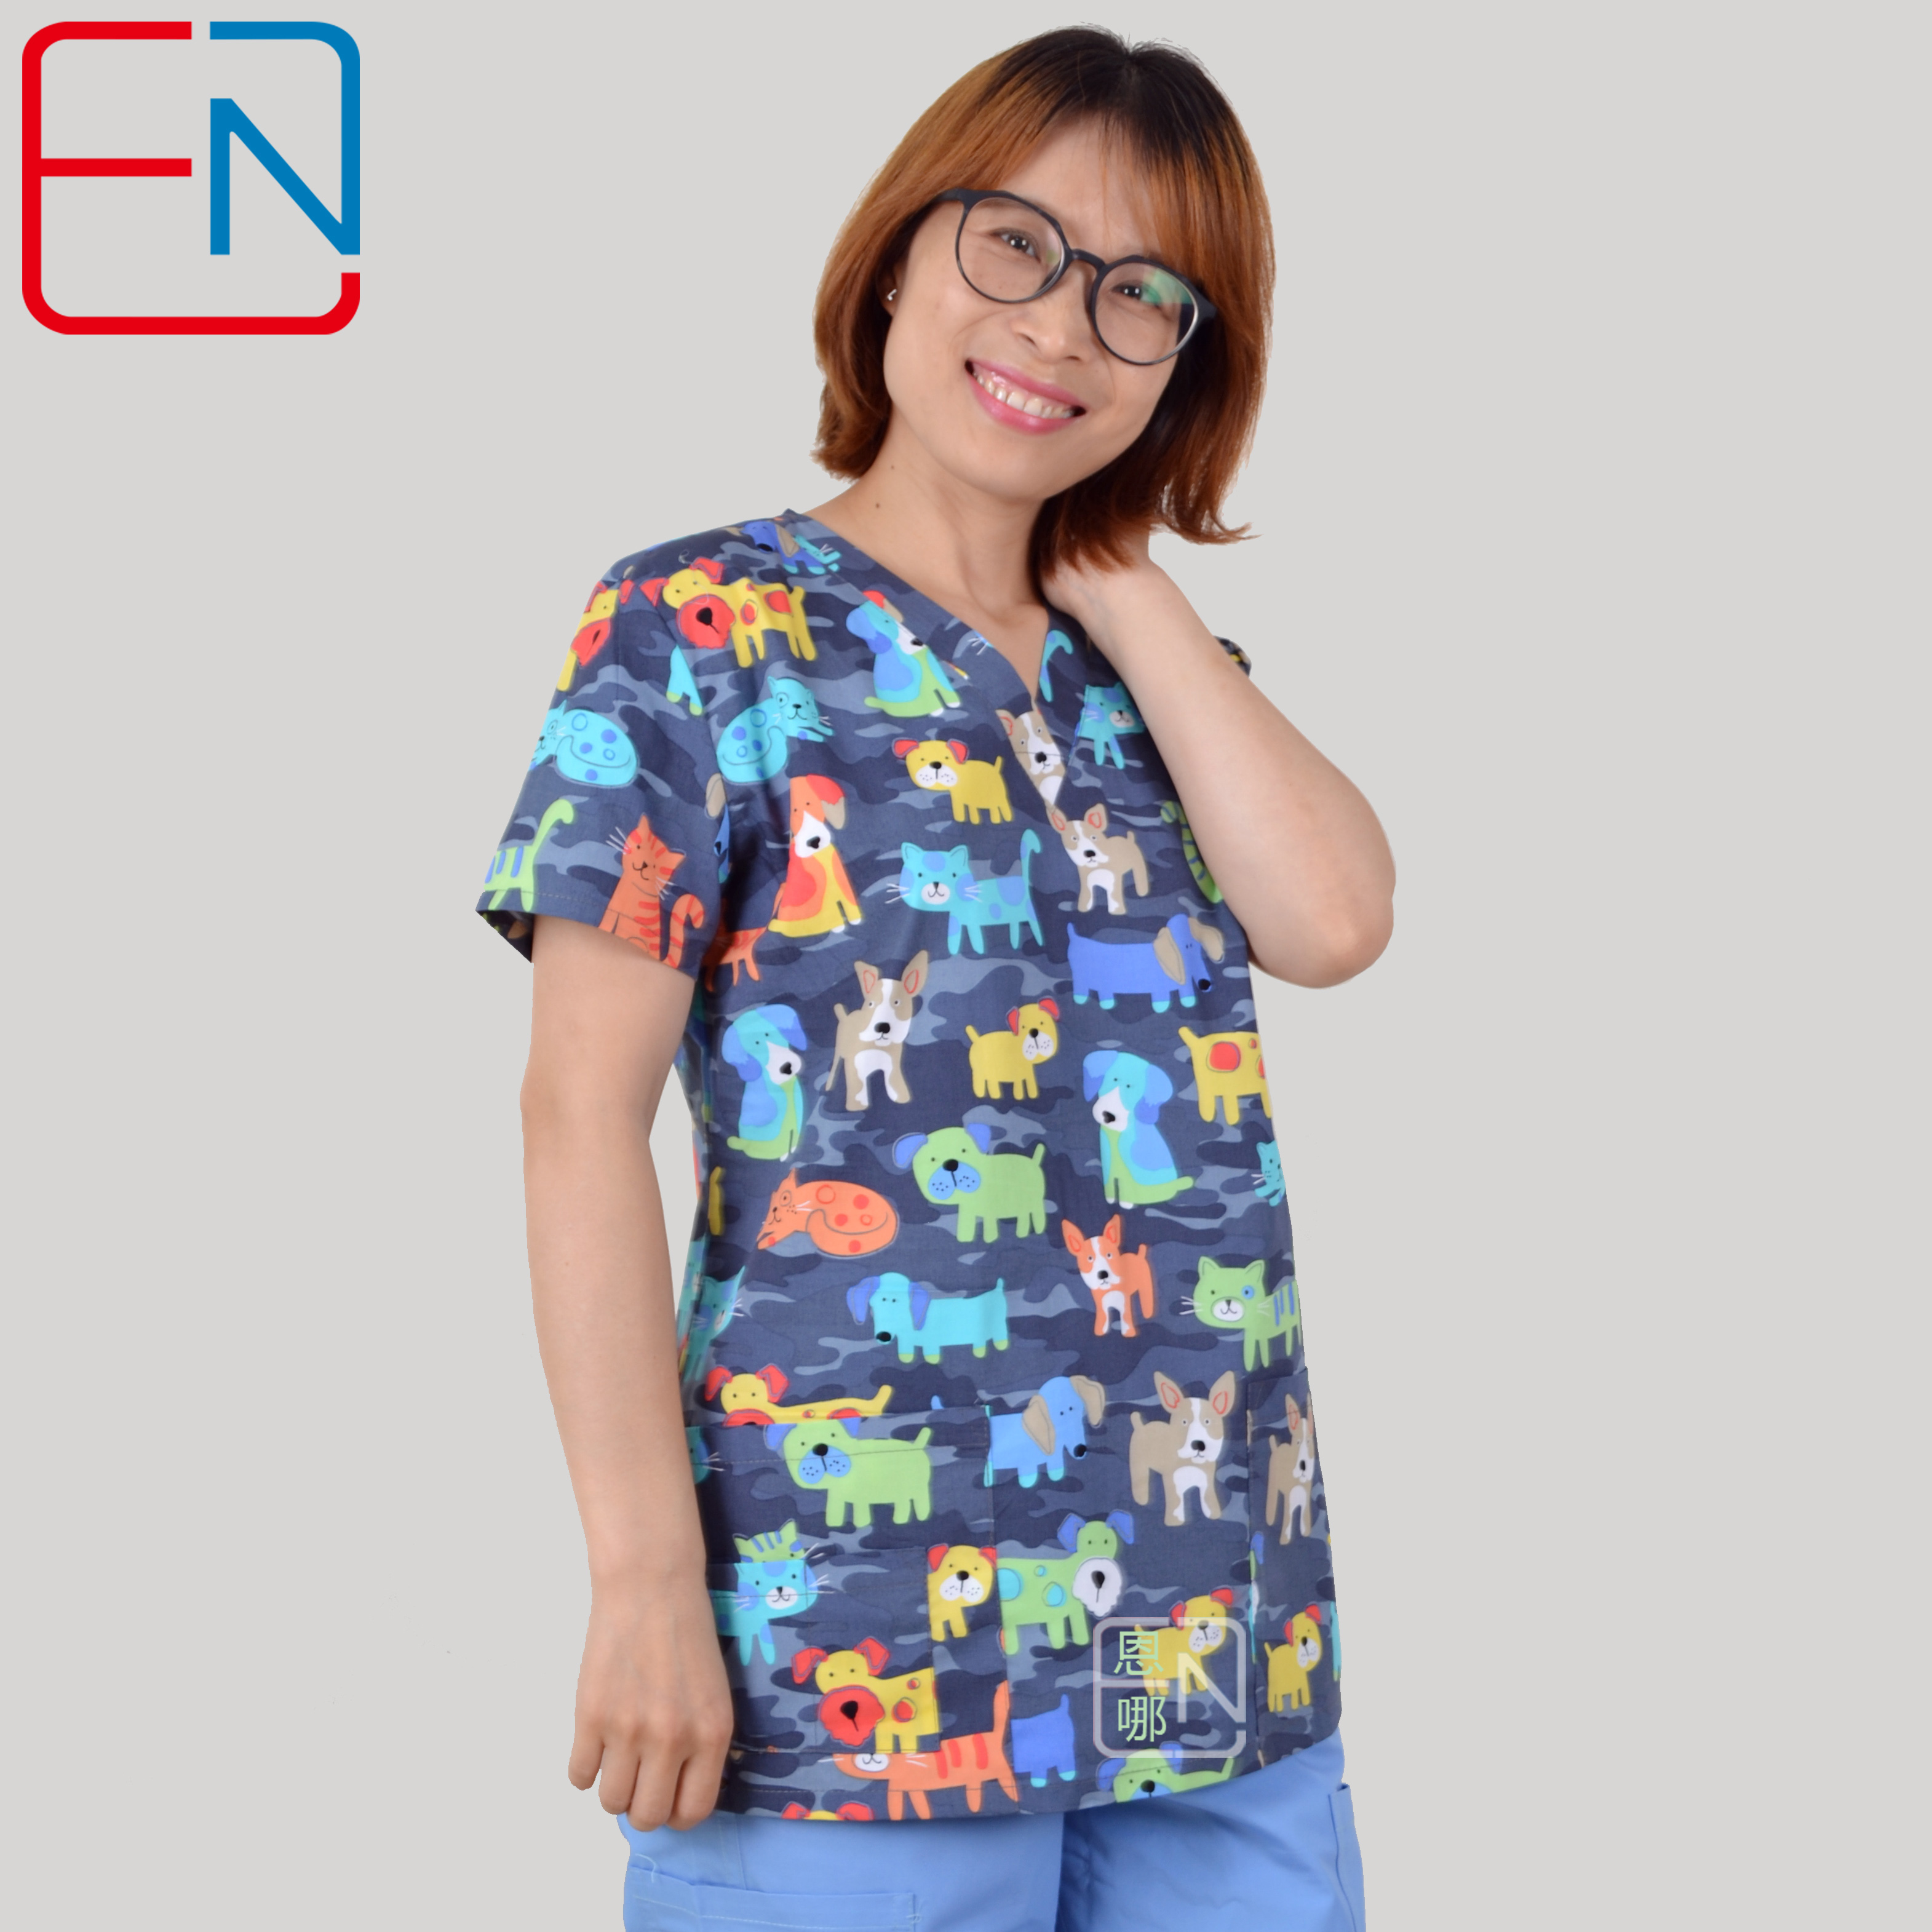 Hennar Women Print Scrub Top V-Neck 100% Cotton Hospital Medical Uniforms 5 Designs Stretchy Surgical Nurse Tops For Women